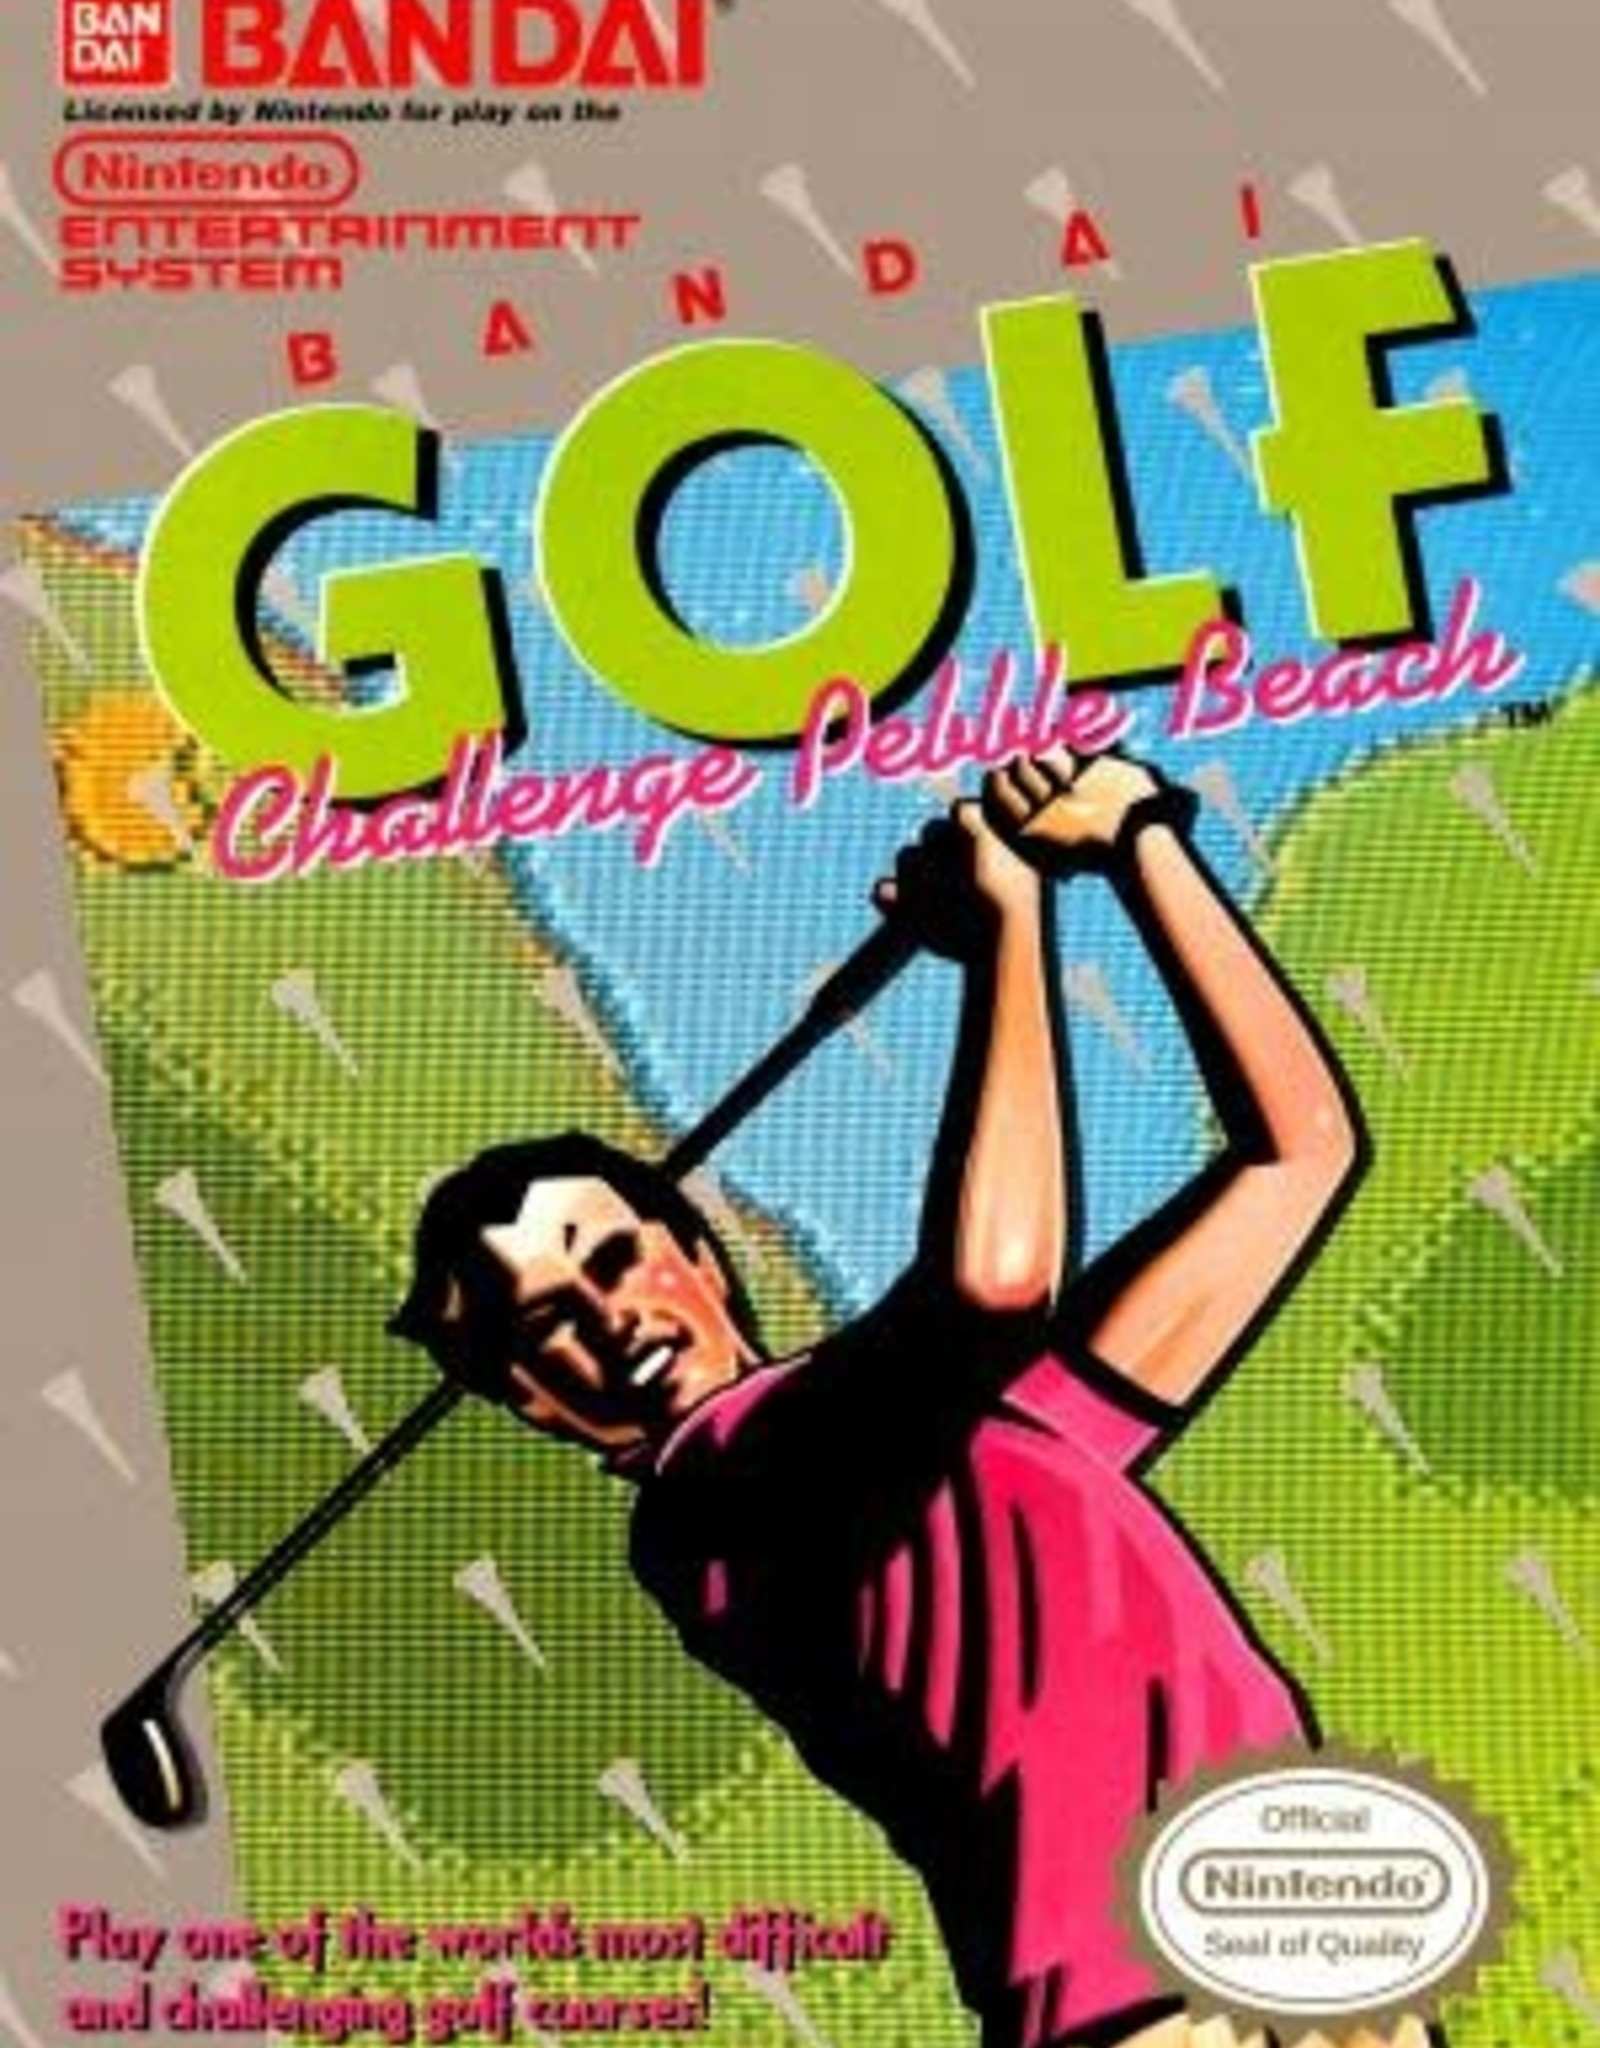 NES Bandai Golf Challenge Pebble Beach (Cart Only)